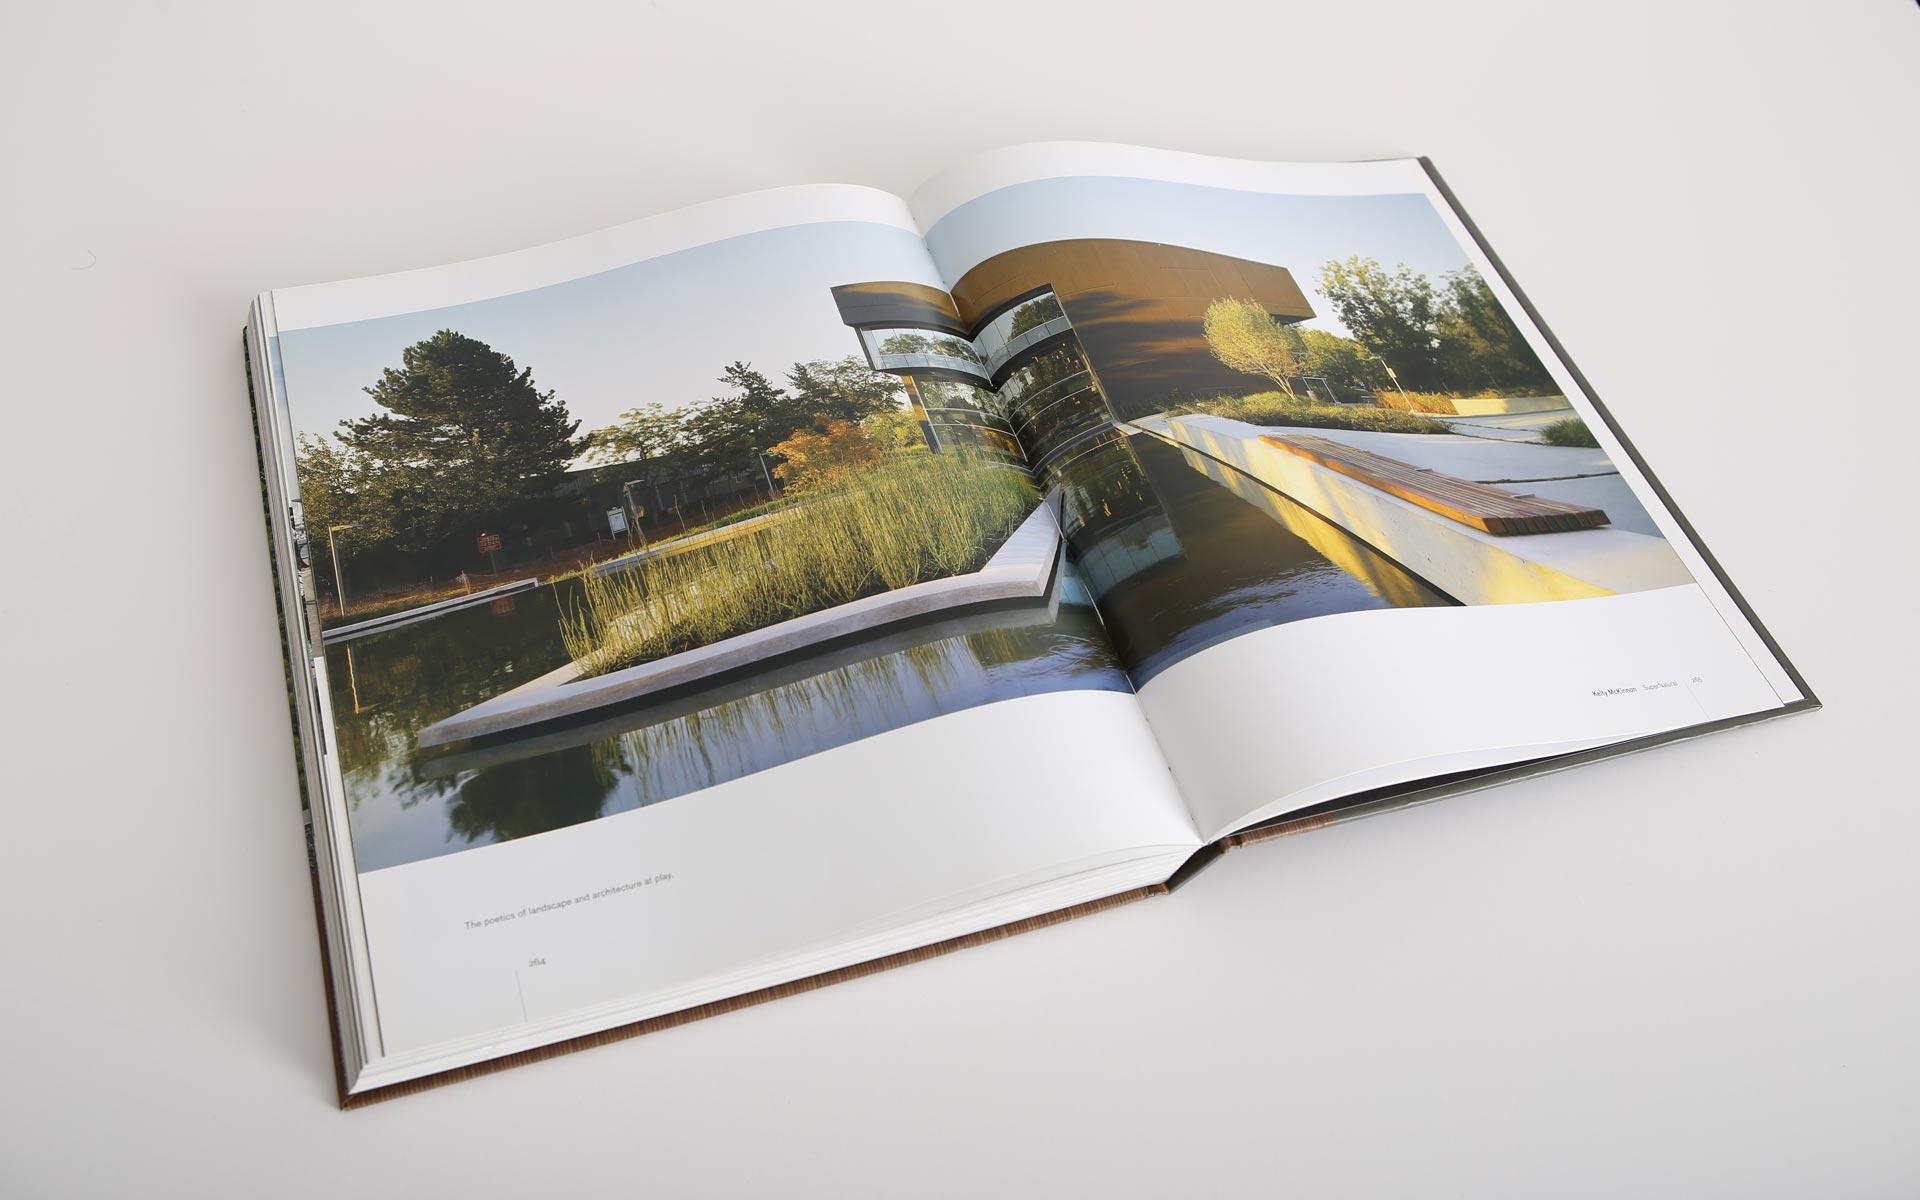 pfs-landscape-architects-book-design-10